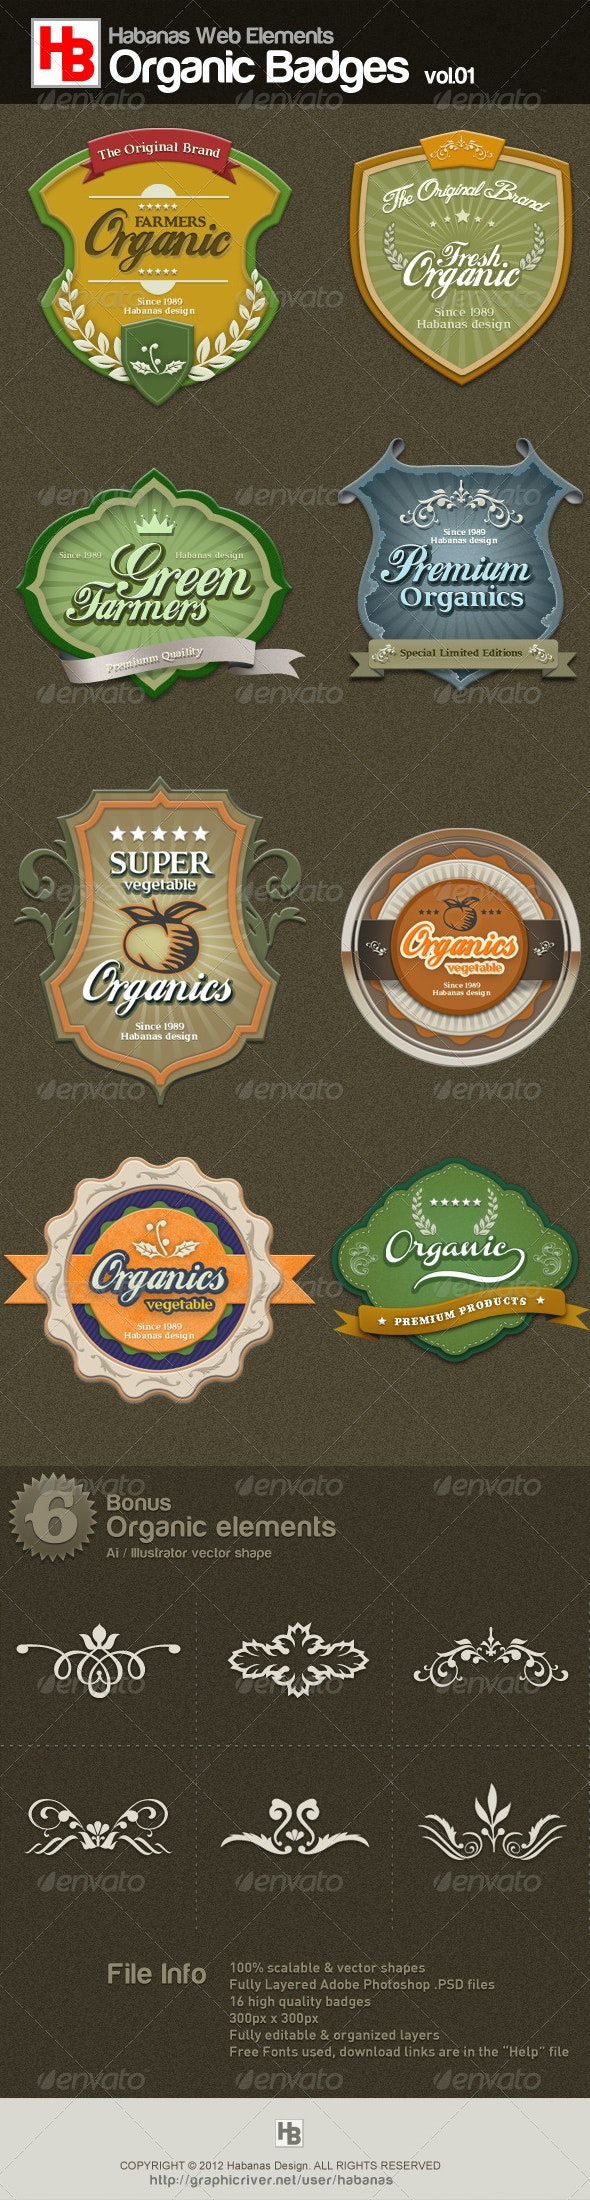 Organic Badges 01 - Badges & Stickers Web Elements